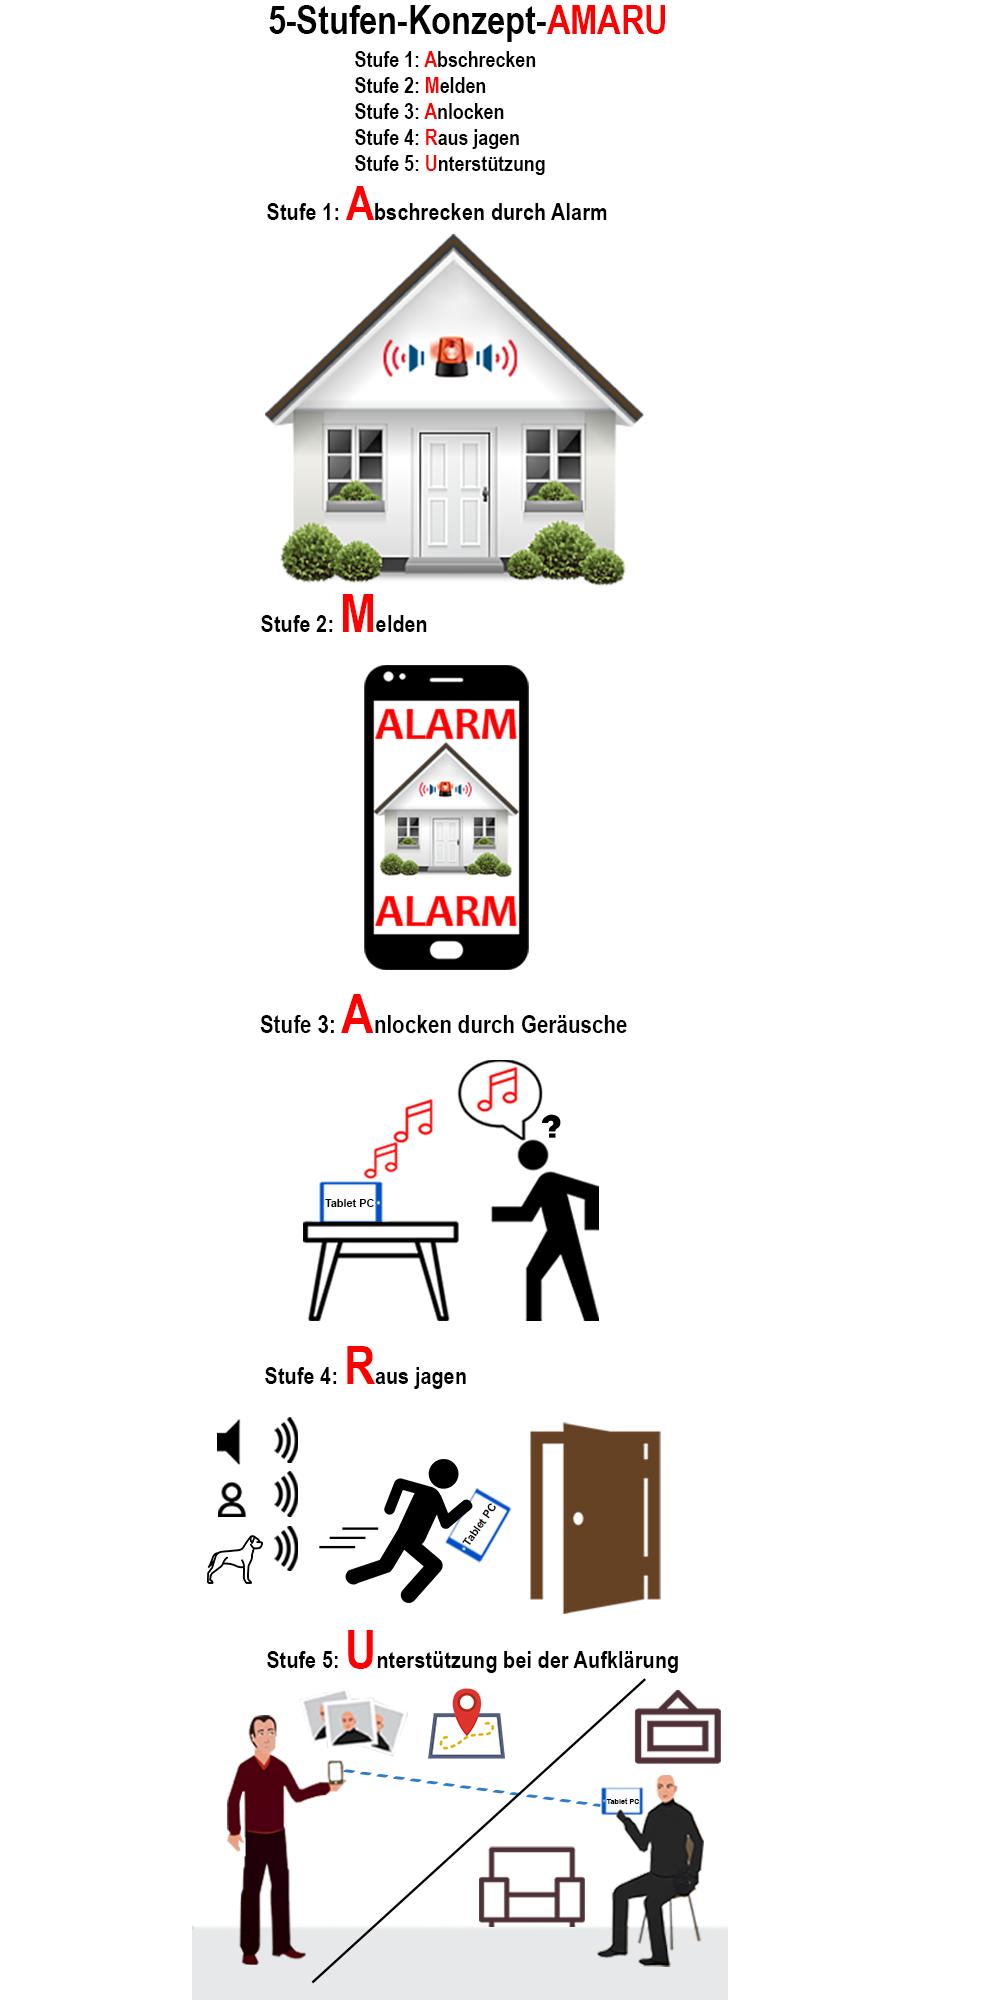 5-Stufen Konzept